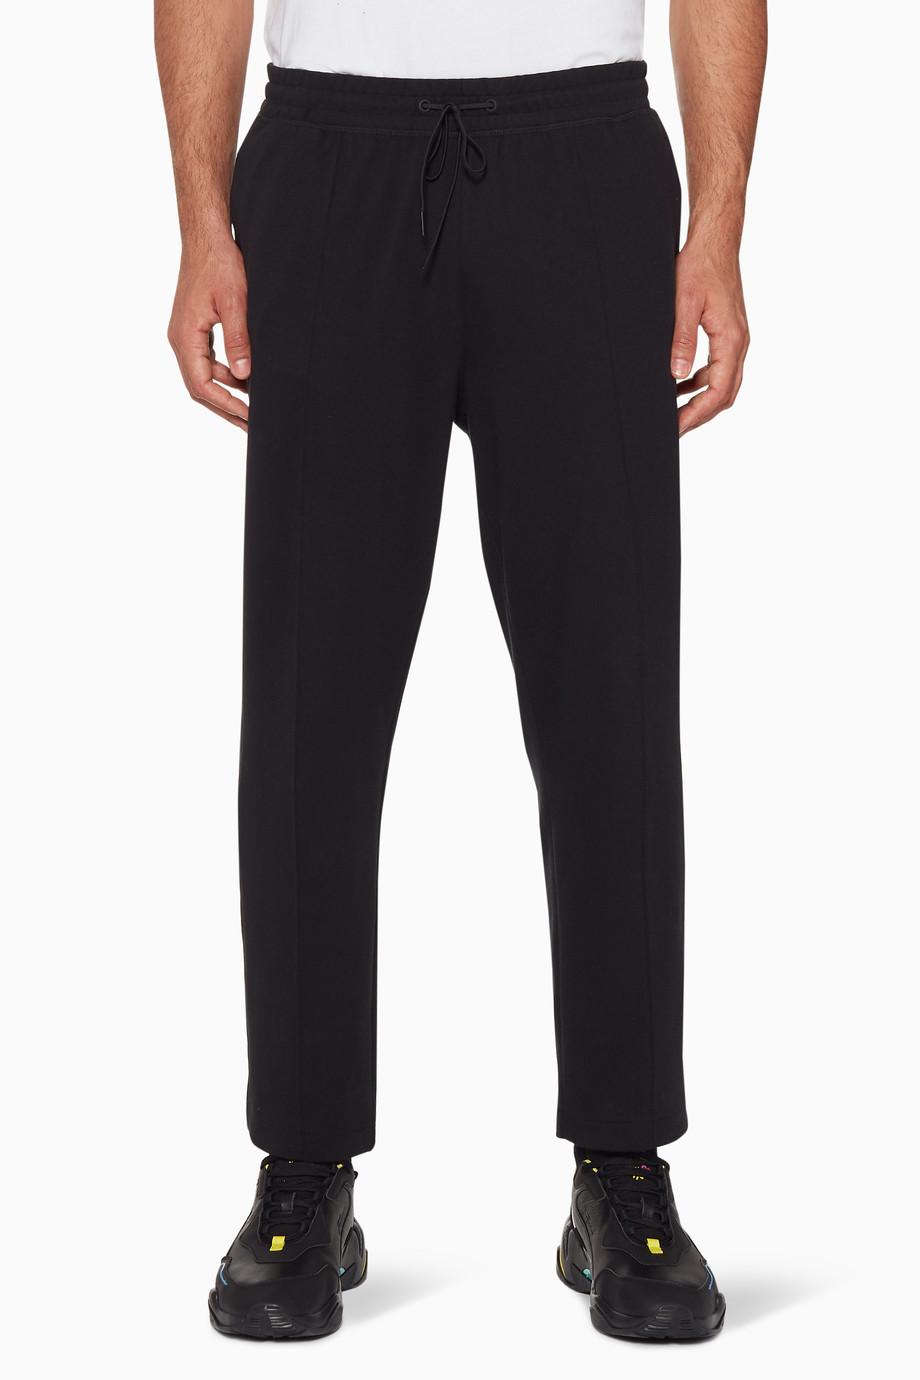 7f1760f907 Shop PUMA Select Black Puma X Bradley Theodore Track Pants for Men ...